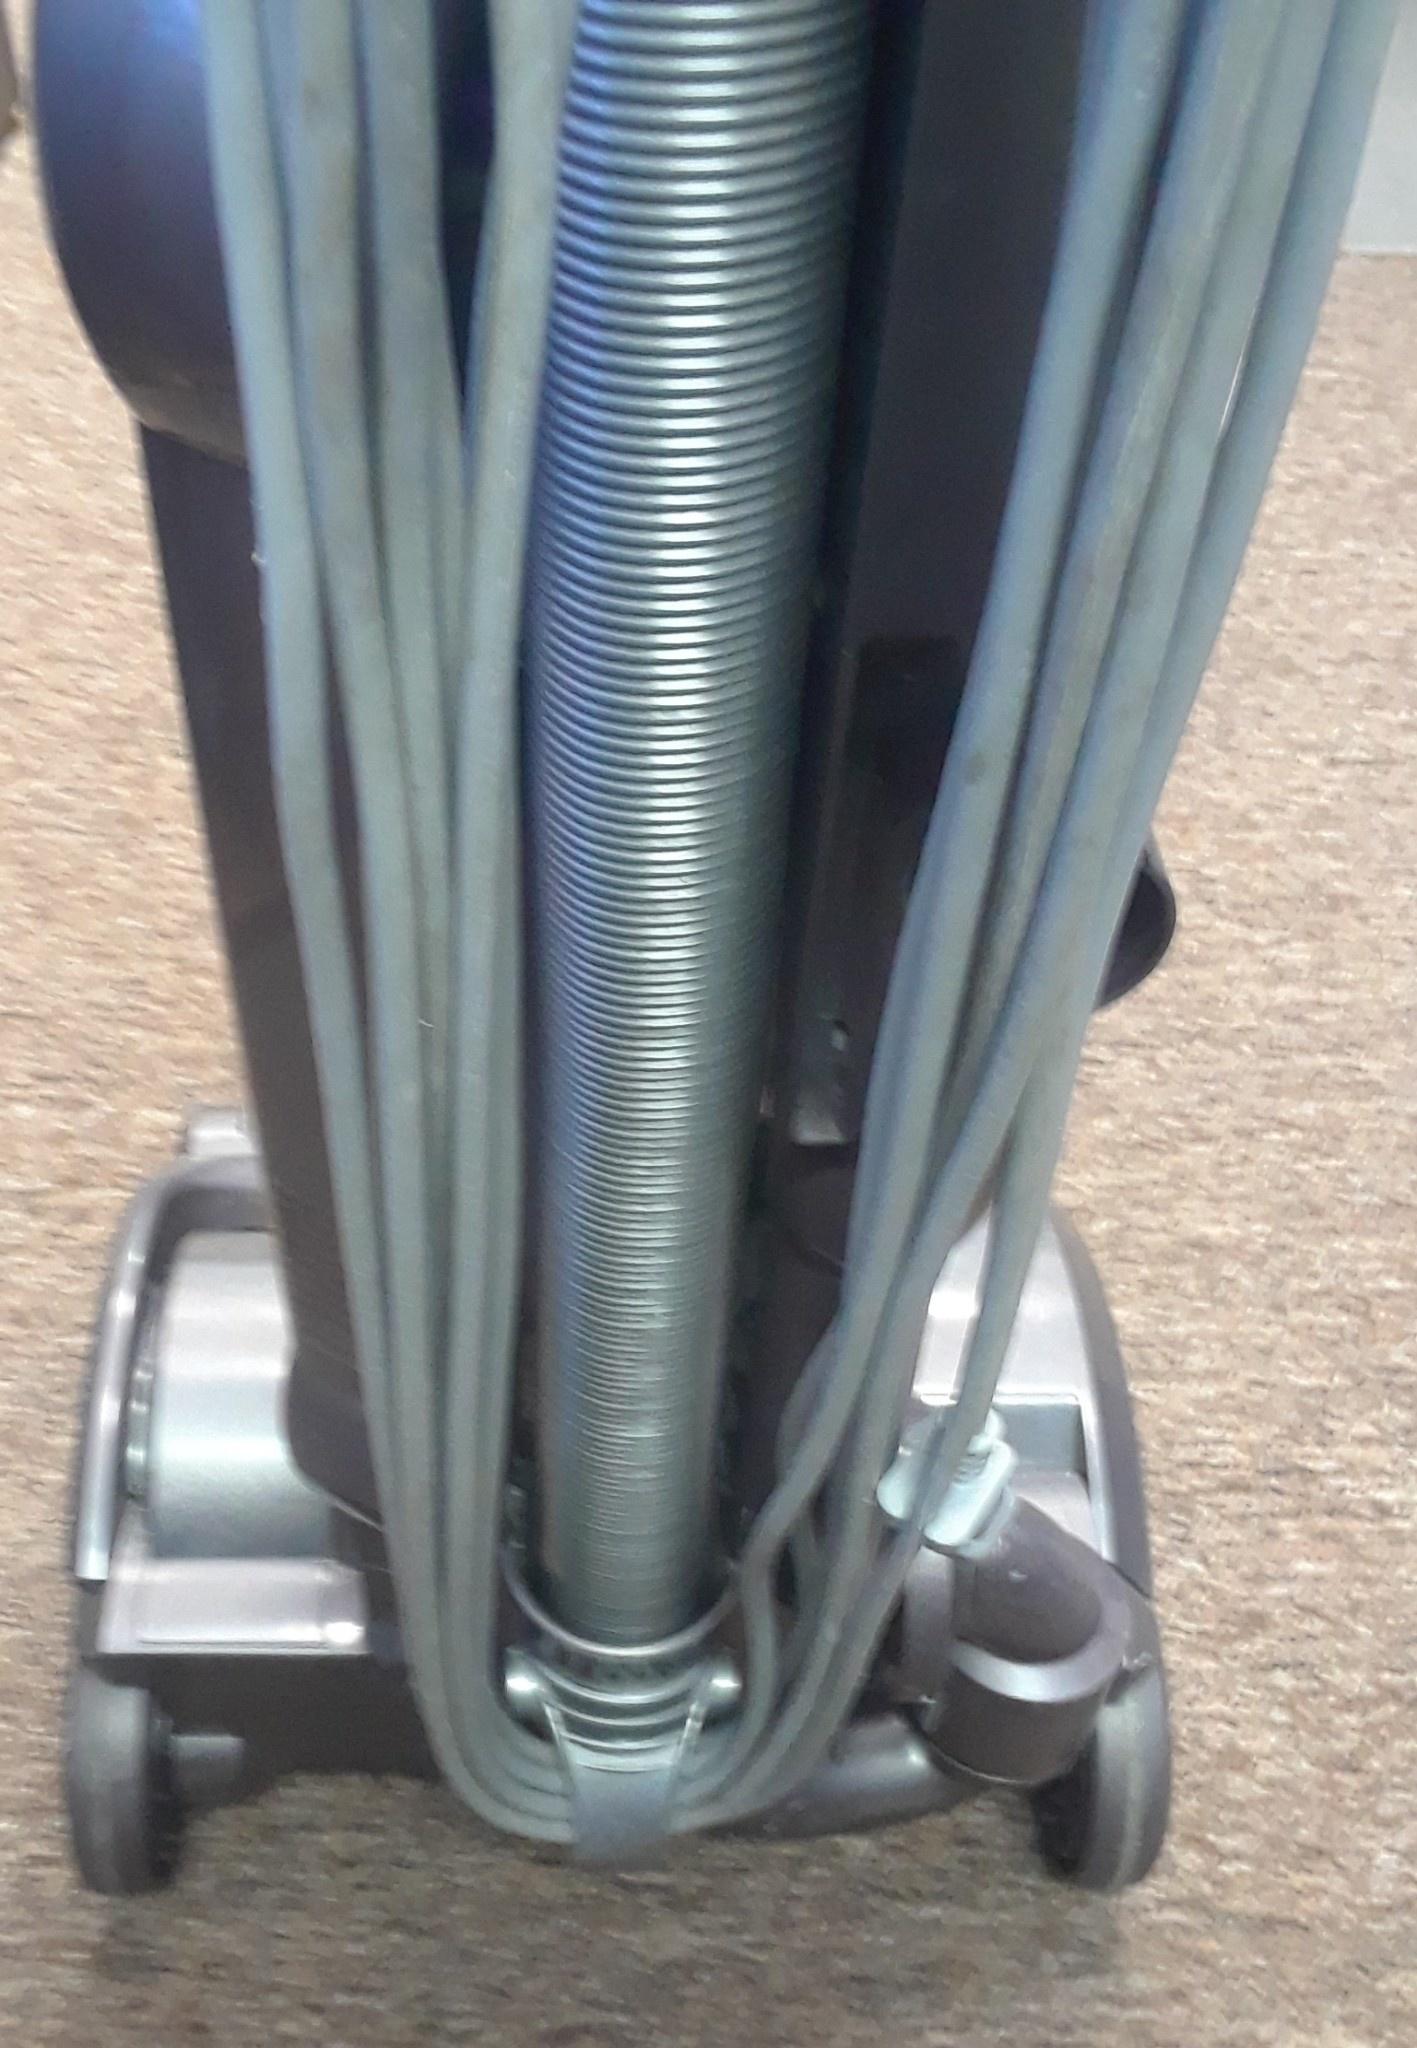 Dyson Refurbished Dyson Upright Vacuum DC17 - #88525